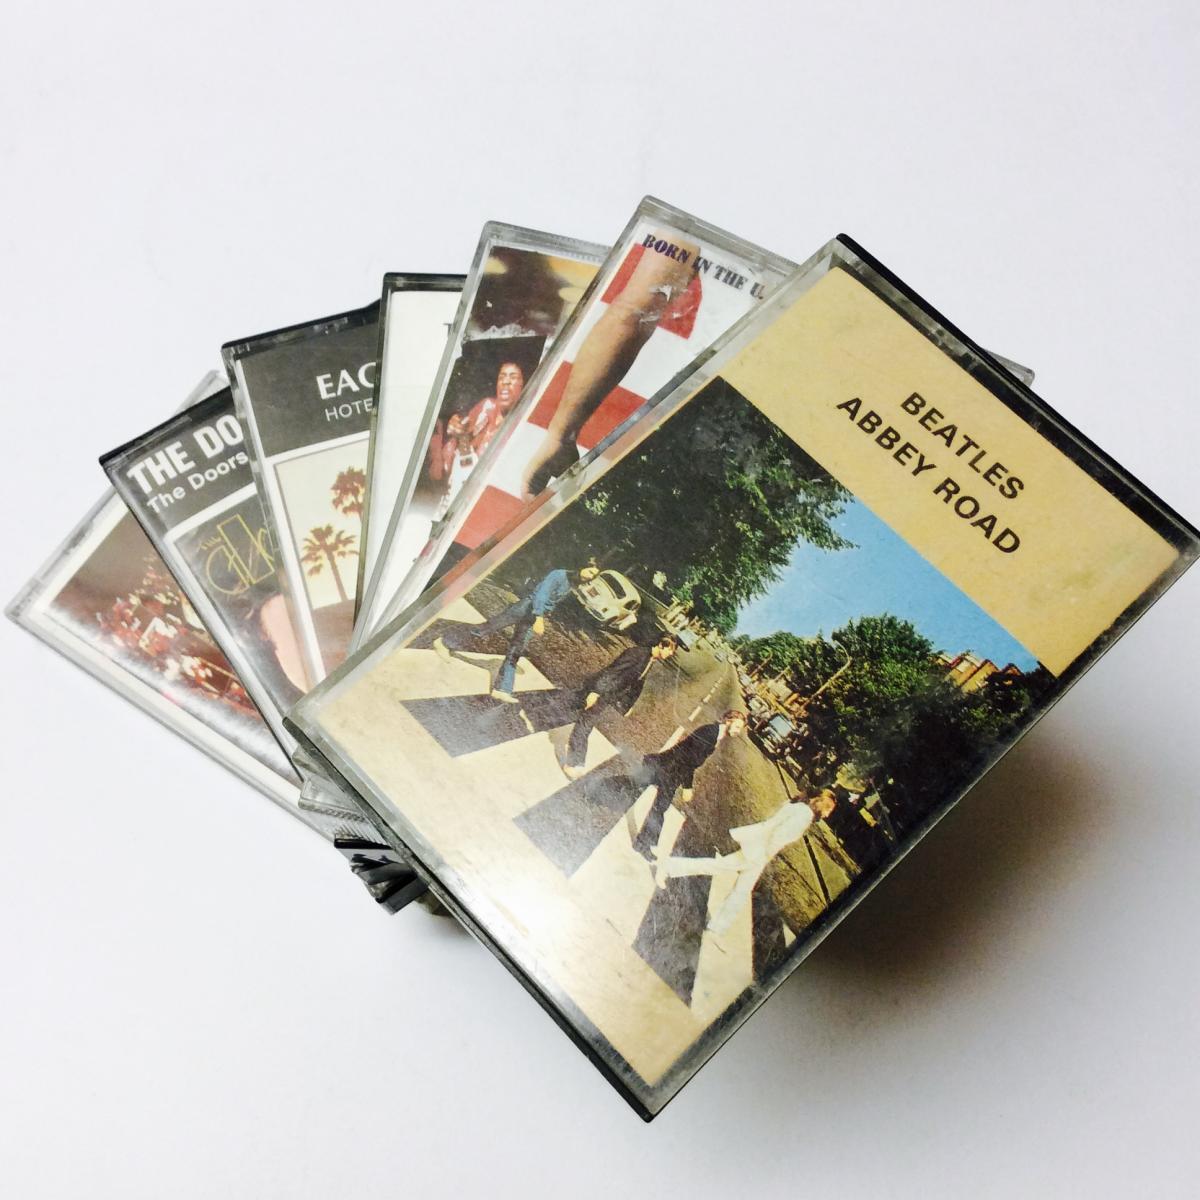 Do cassette tapes really deserve to make a comeback?